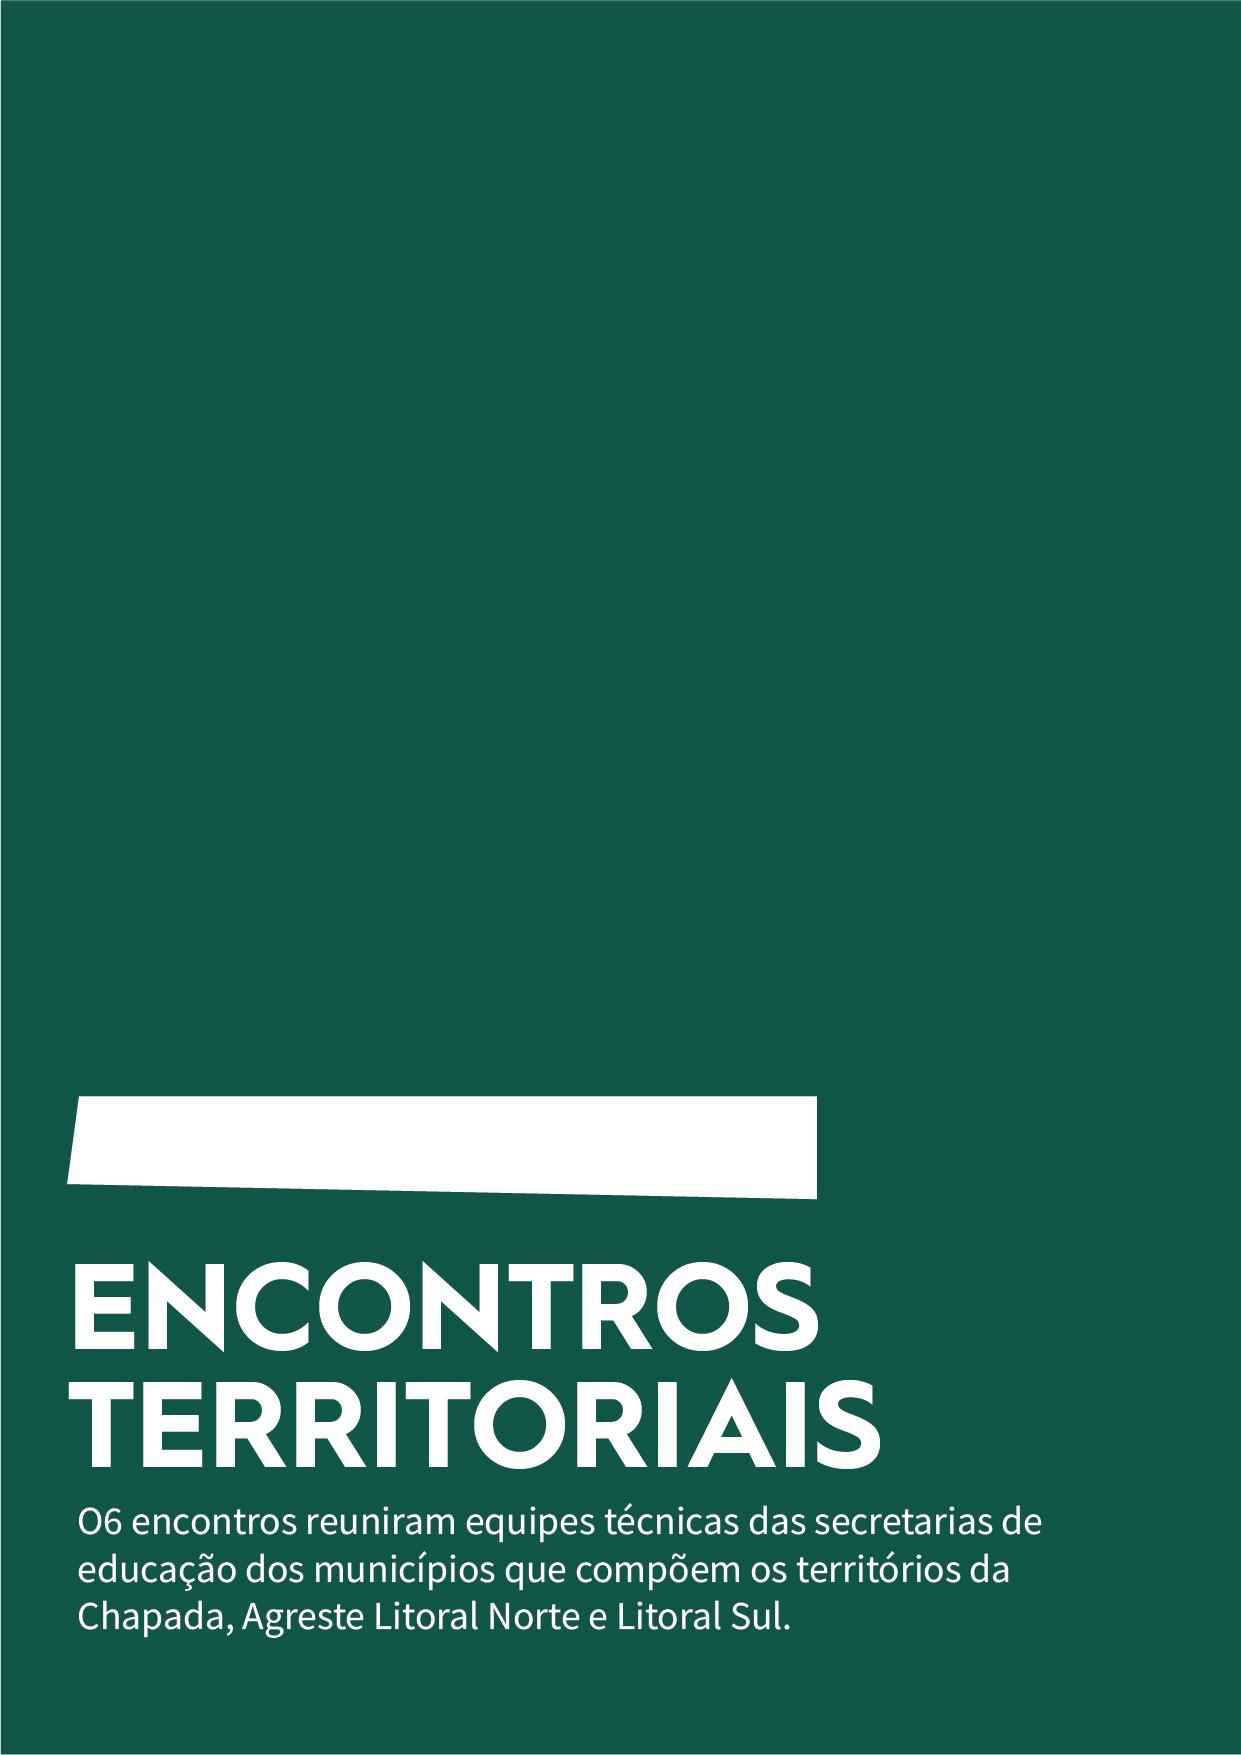 ICEP - Boletim edição 2, versão impressa_Fundo copy